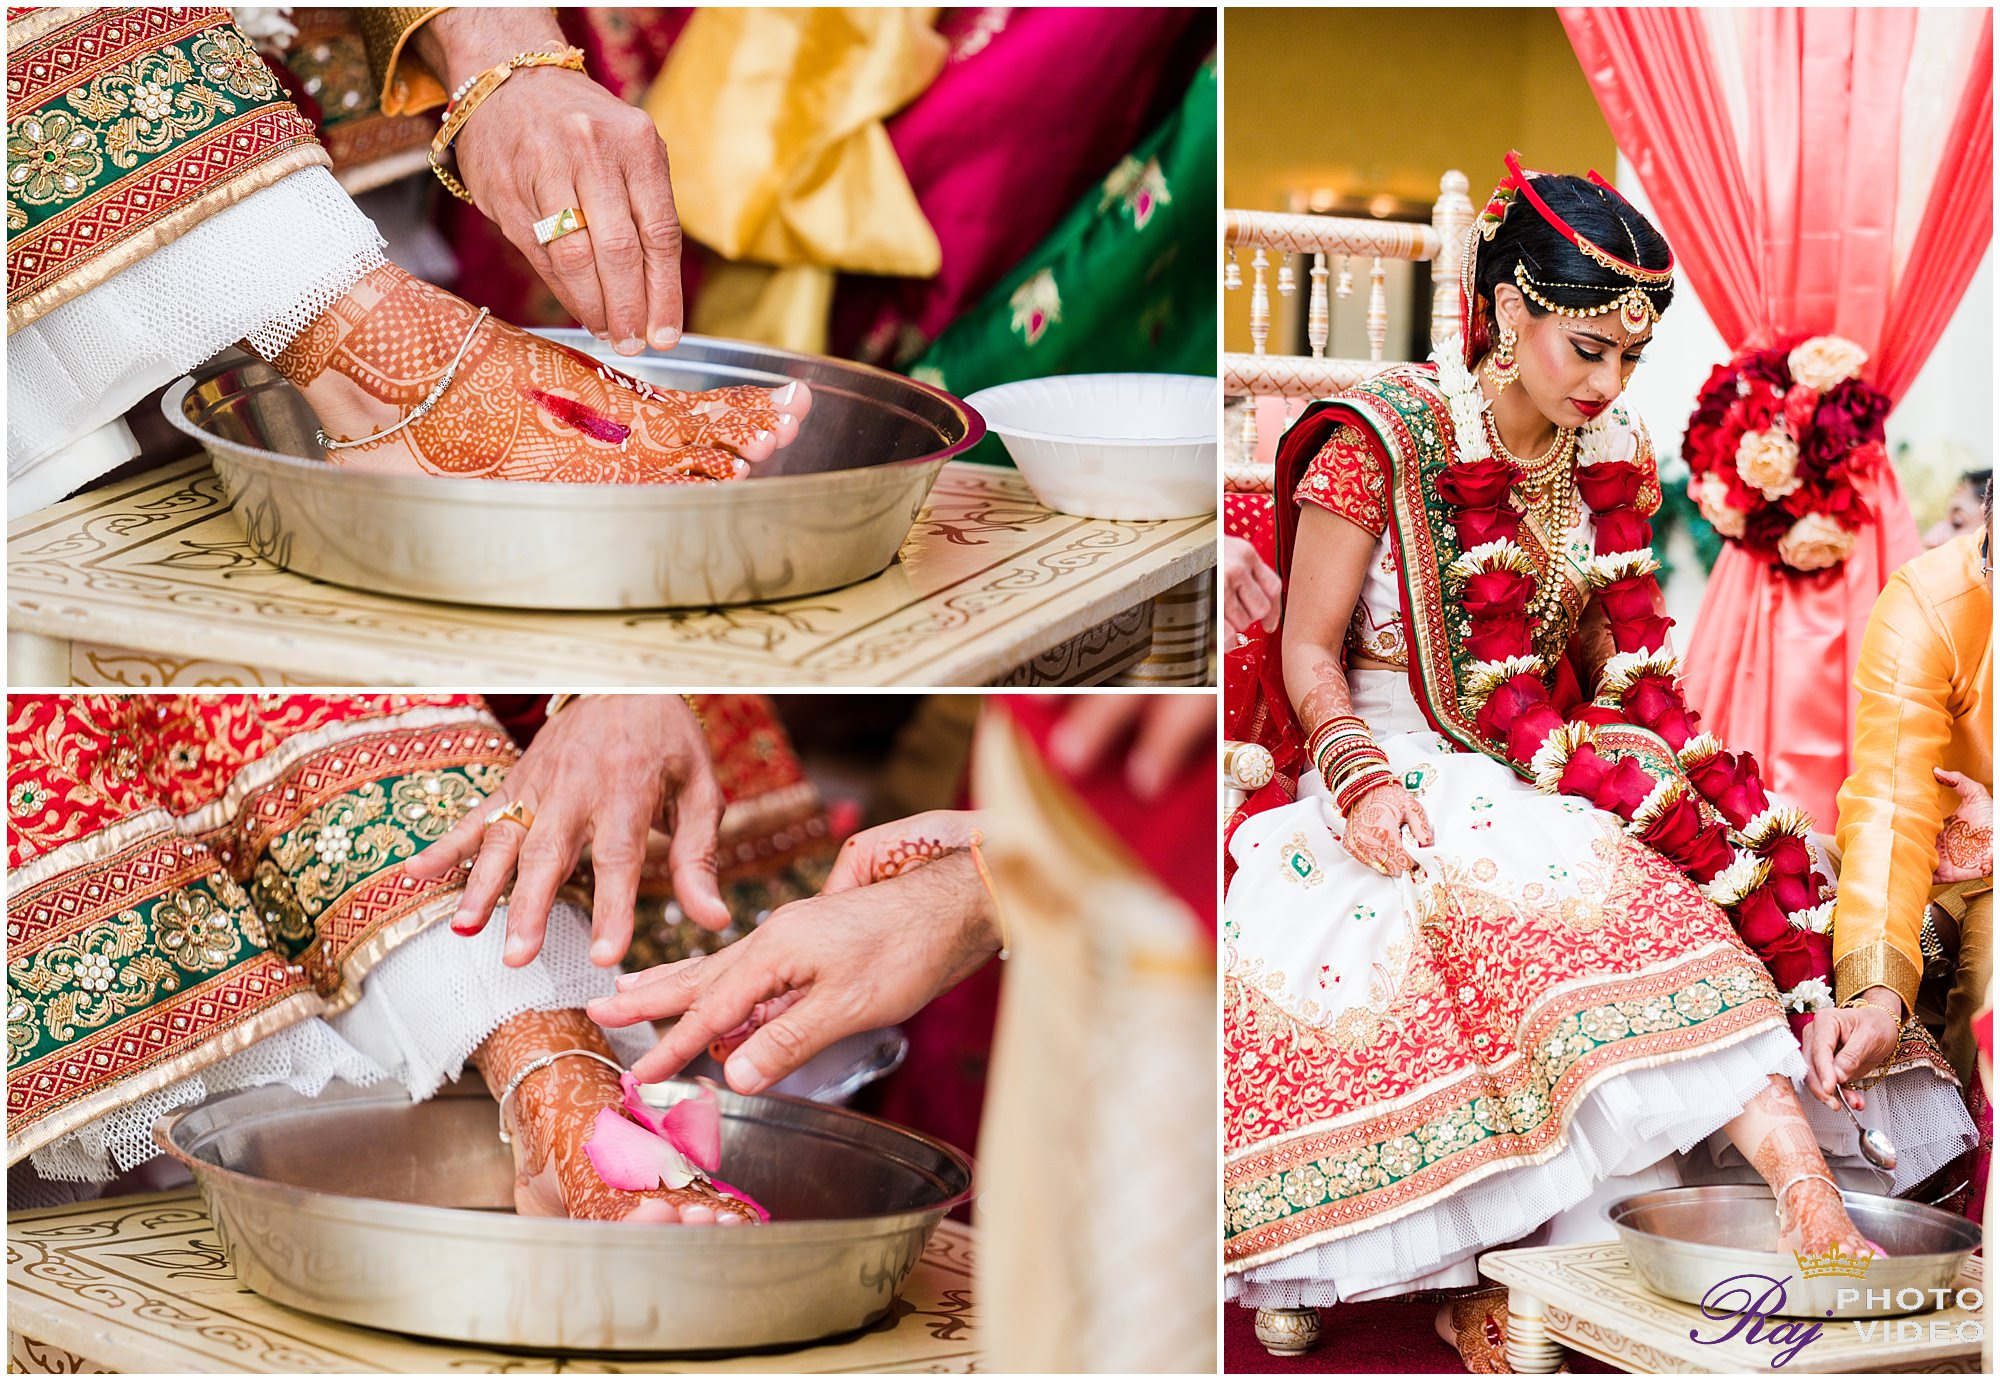 Founders-Inn-and-Spa-Virginia-Beach-VA-Indian-Wedding-Harini-Vivek-54.jpg